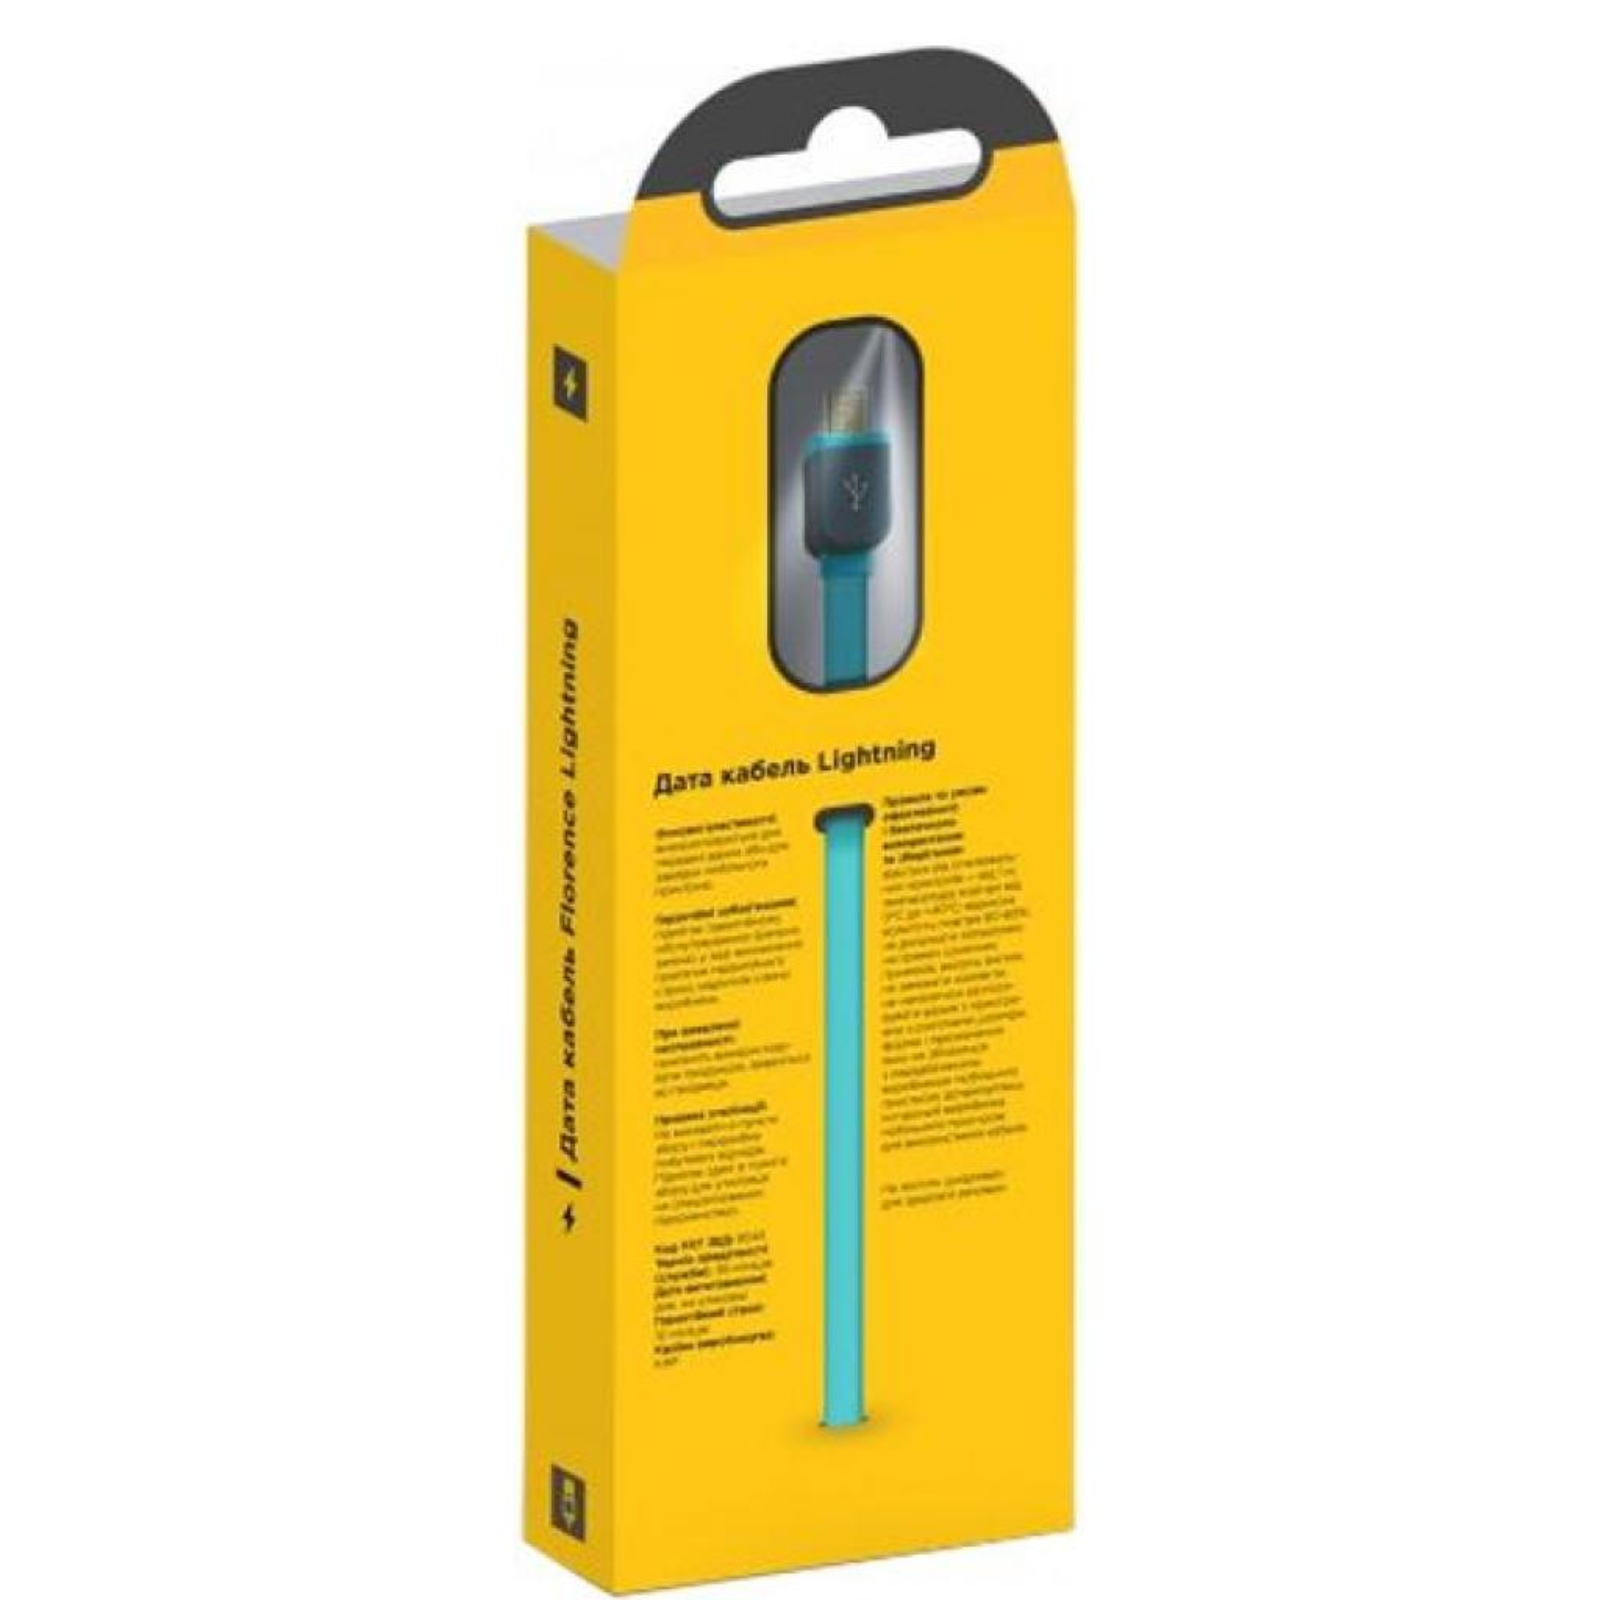 Дата кабель USB 2.0 AM to Lightning 1.0m Color Auqamarin Florence (FDC-L1-2A) изображение 2